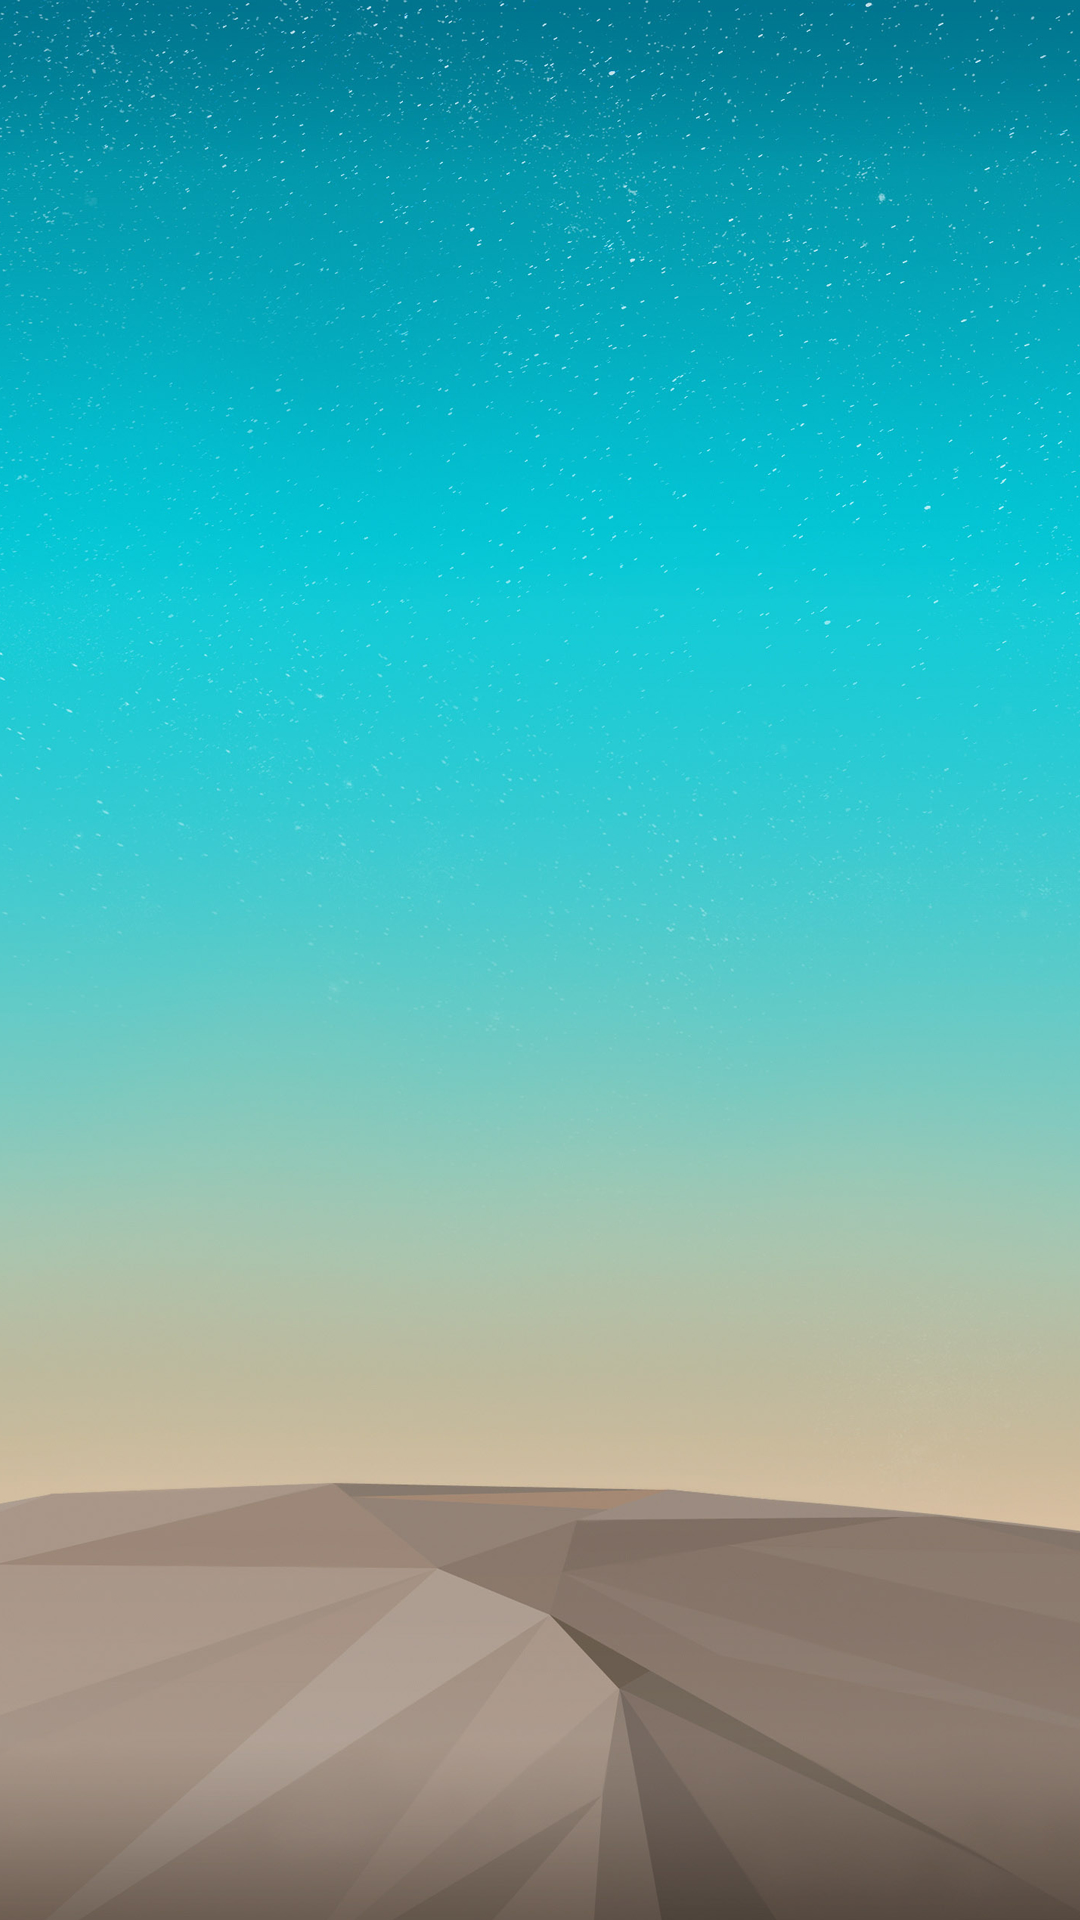 Poly Hill iphone 6 wallpaper ilikewallpaper com 1080x1920